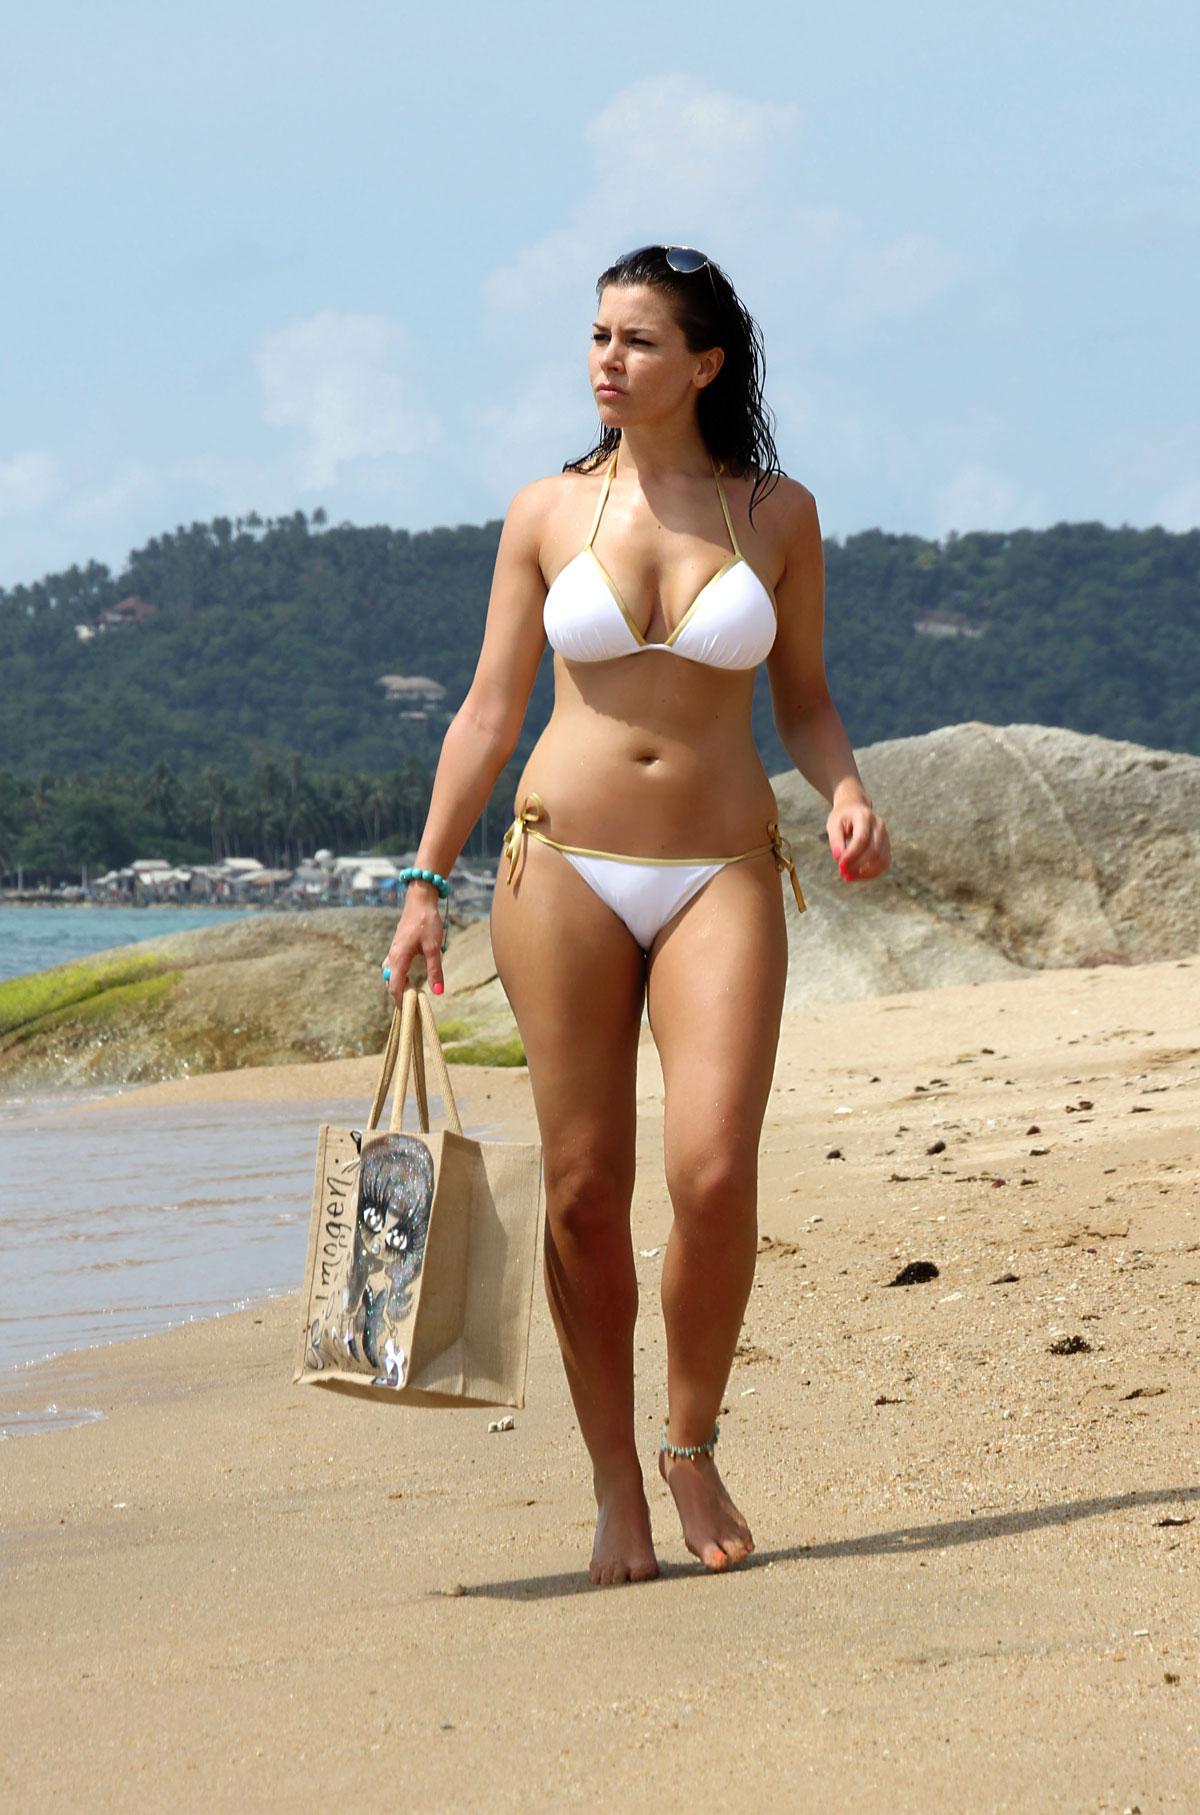 Bikini Imogen Thomas nude (41 photos), Tits, Leaked, Boobs, cameltoe 2019